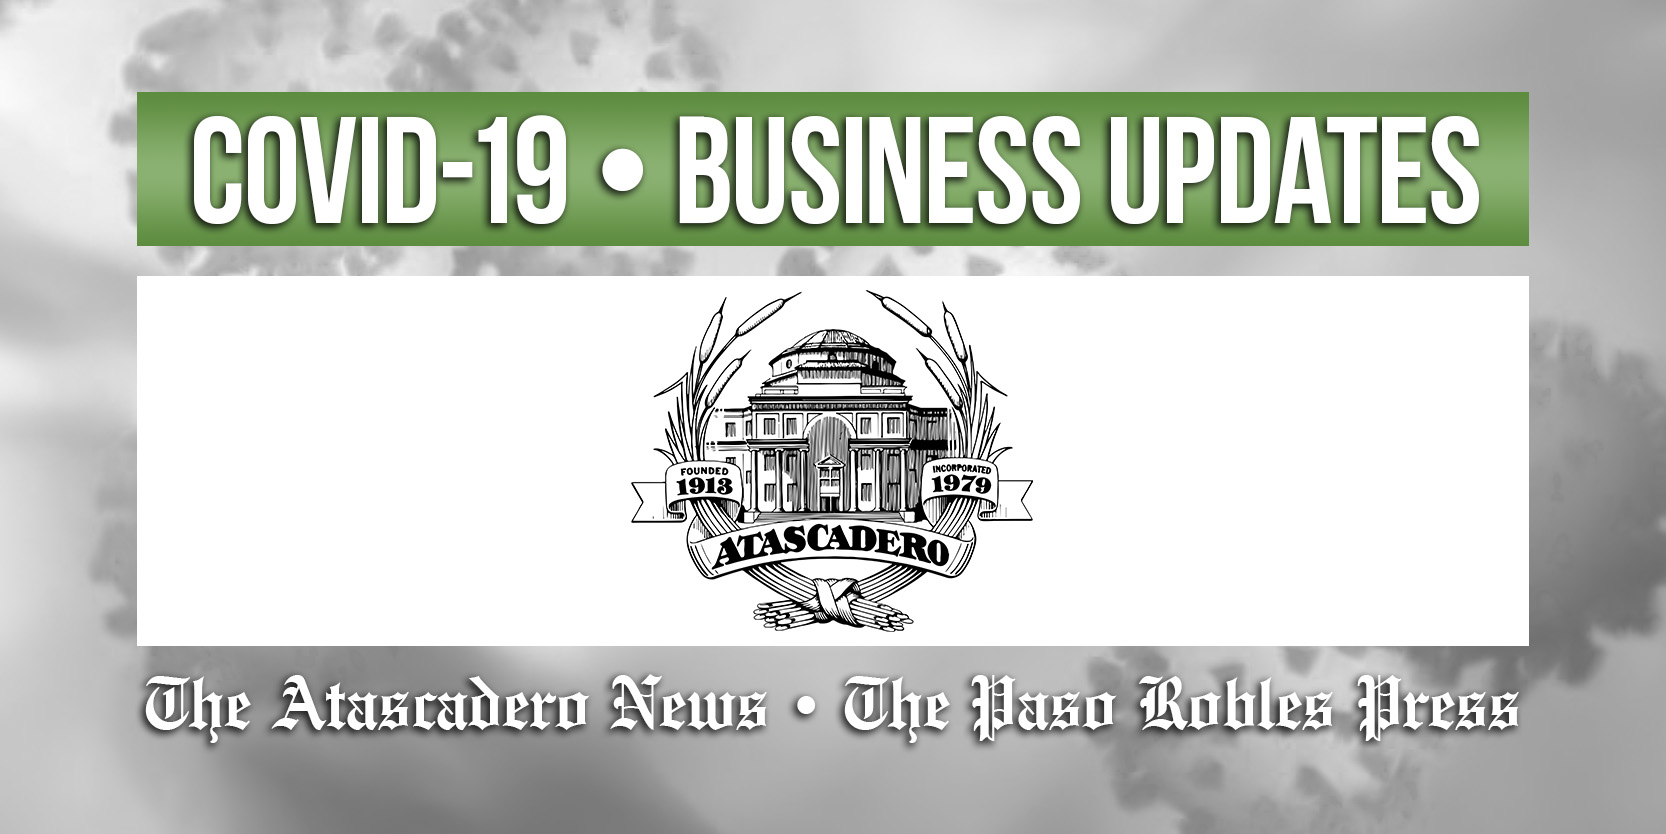 Local Business Updates For Atascadero • Atascadero News photo